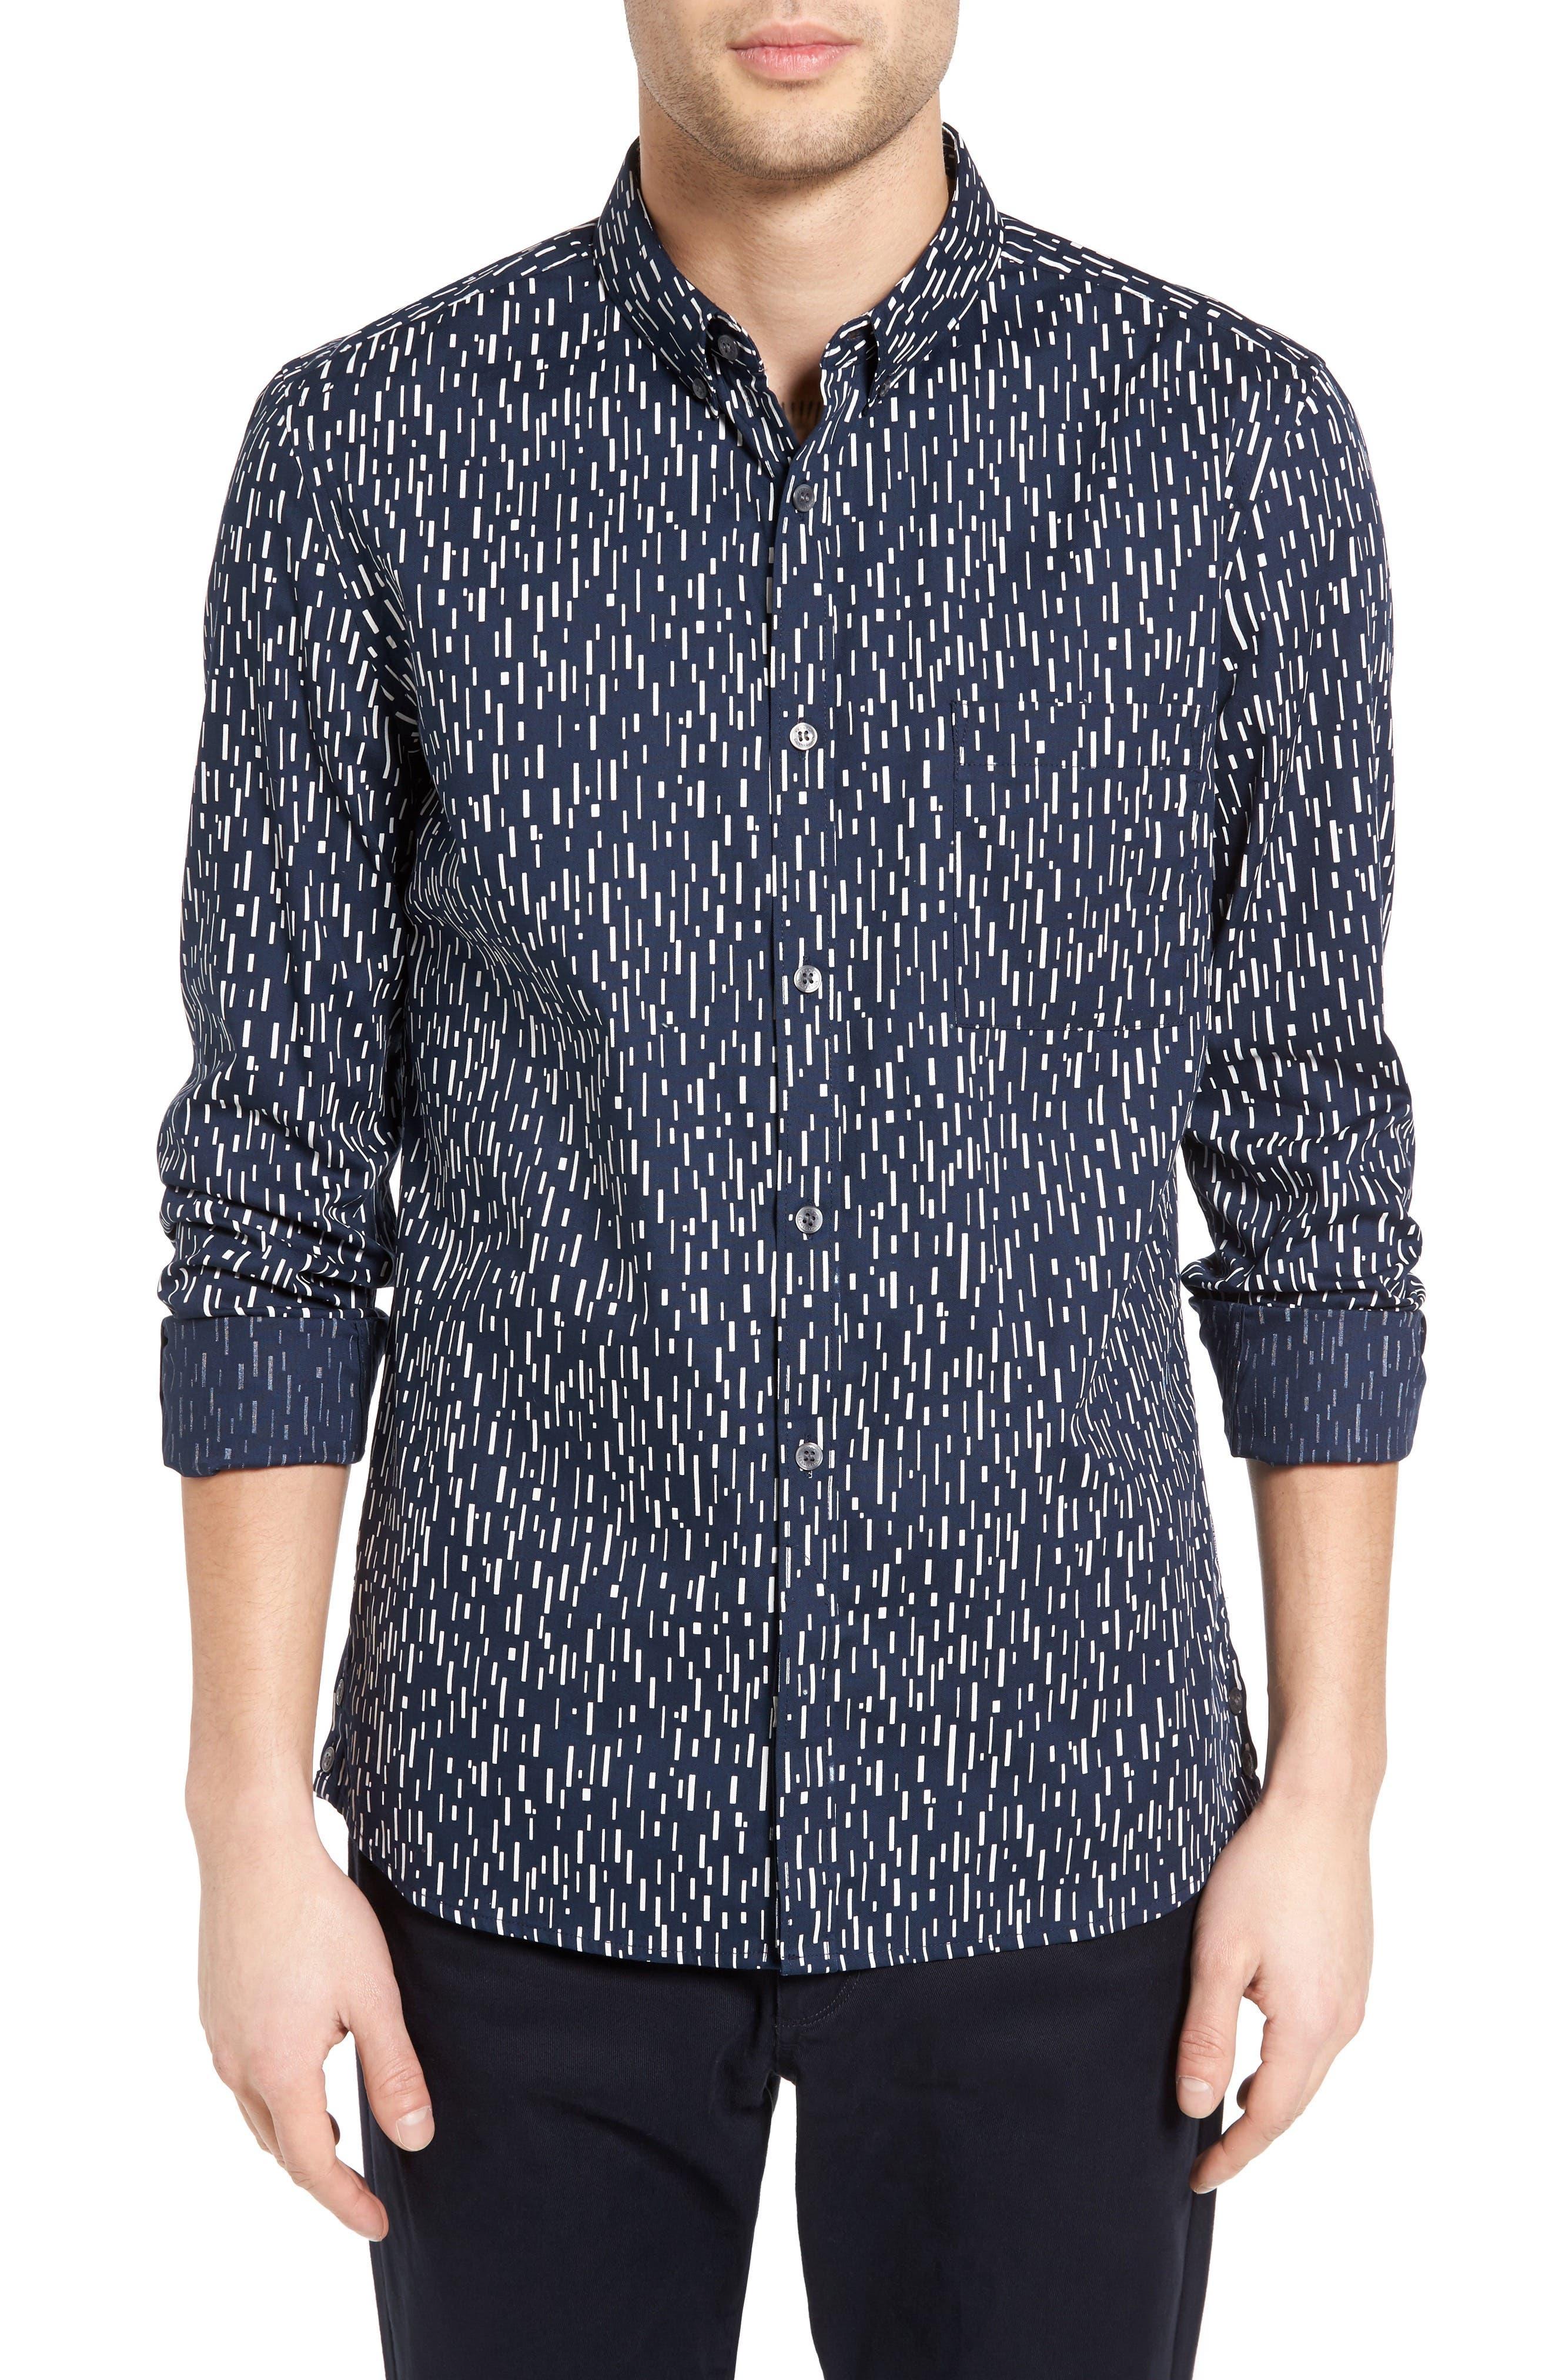 Rain Dash Slim Fit Oxford Shirt,                         Main,                         color, Marine Blue/ White